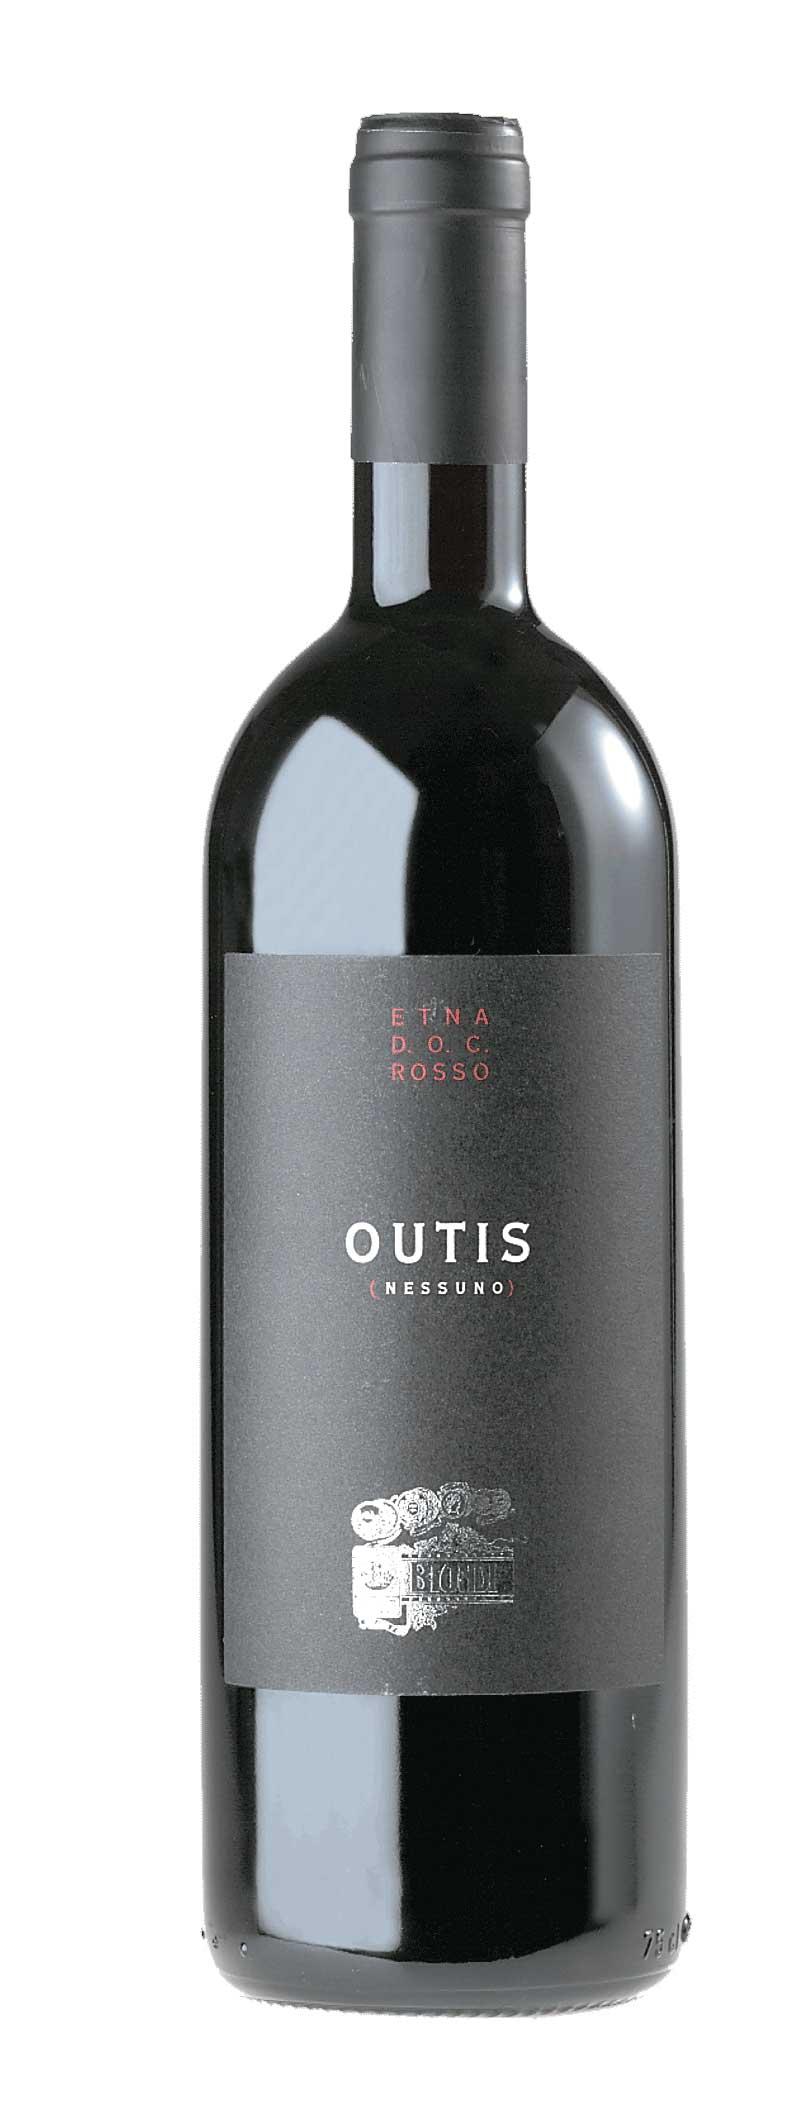 Outis Etna Rosso ( Azienda Agricola Biondi ) 2002